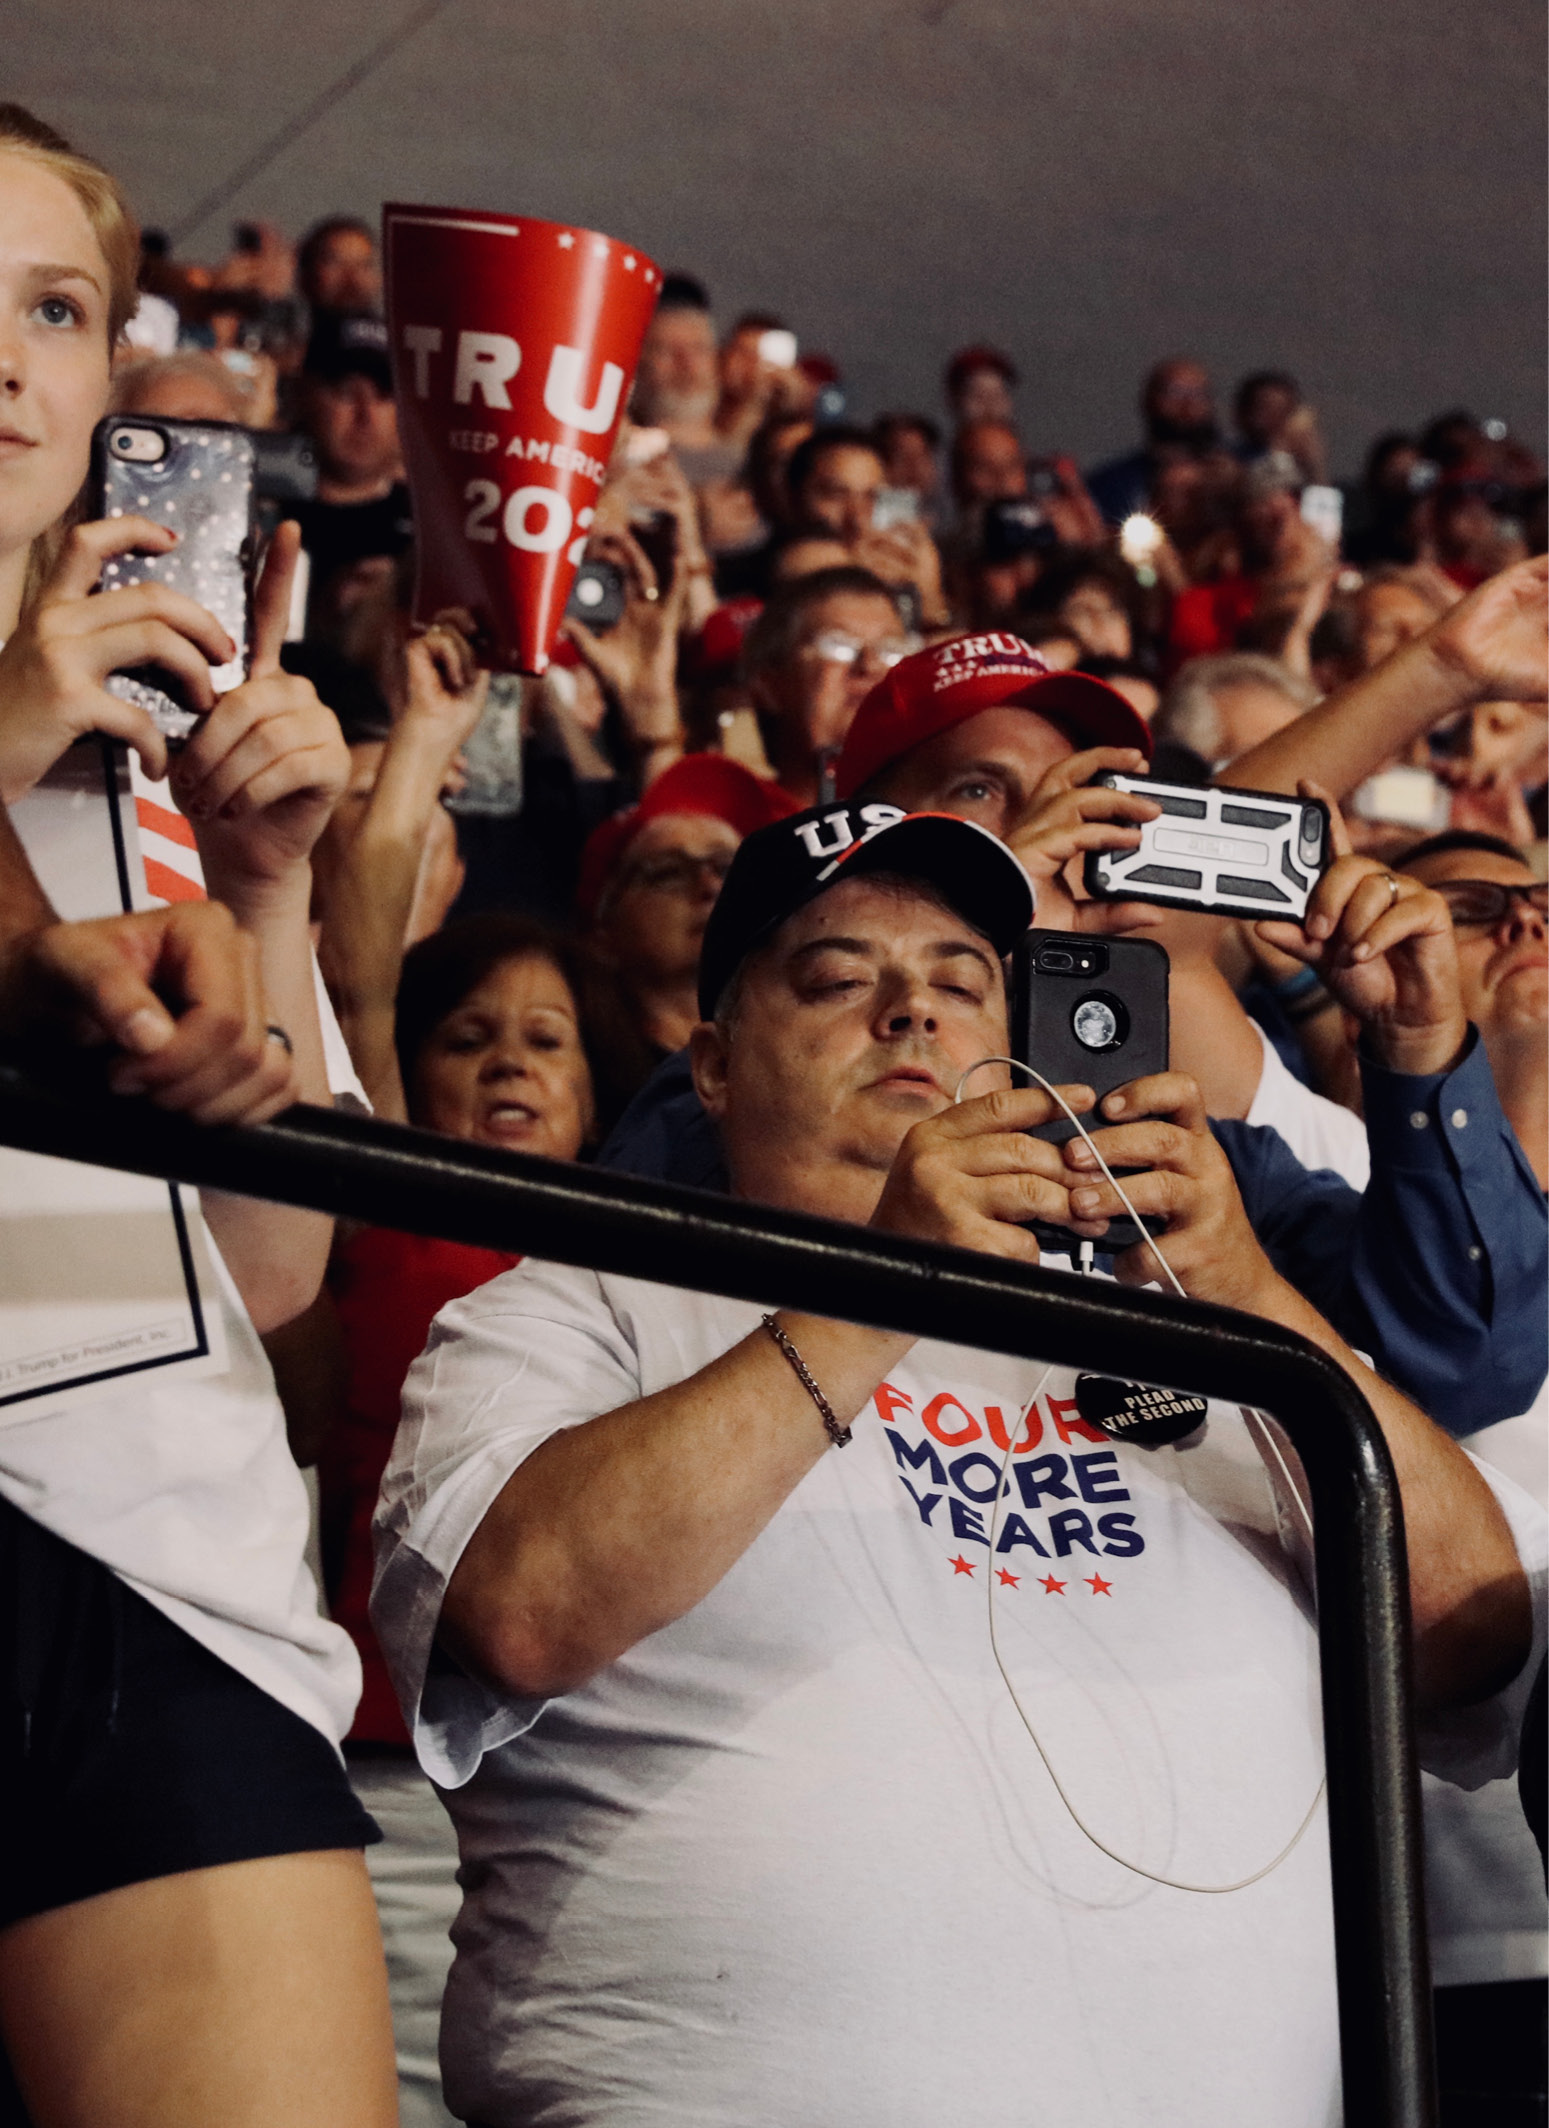 Andy Grant Trump Rally 8.1.19 - II23.jpg